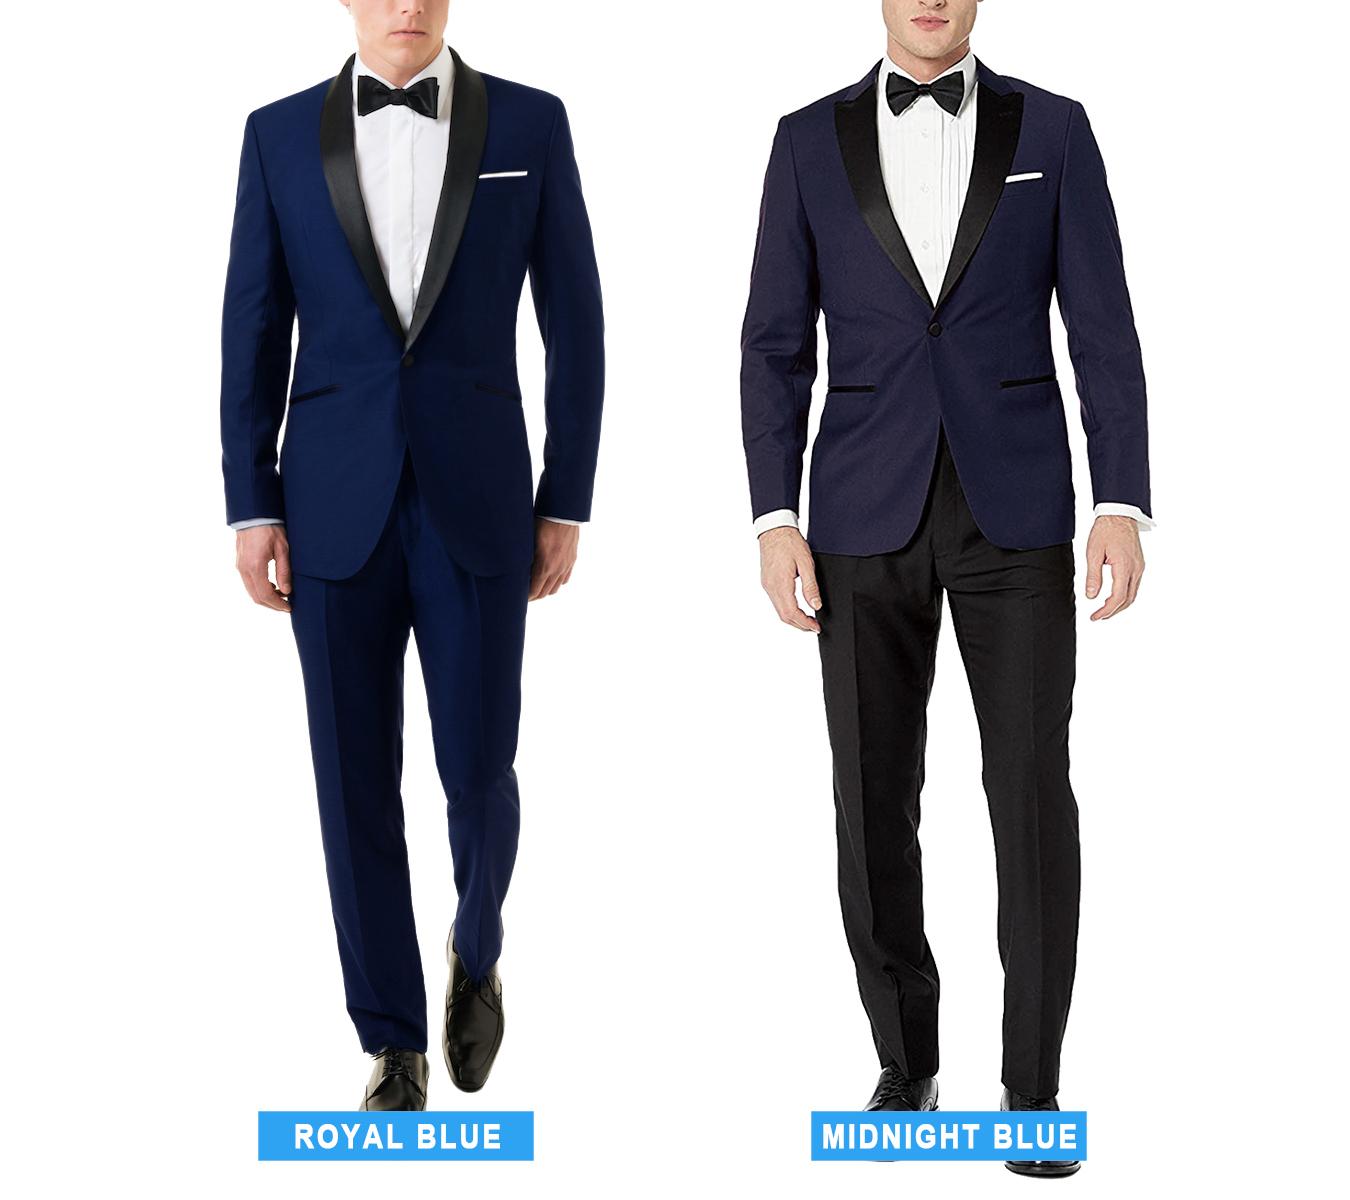 royal blue vs. midnight blue tuxedo